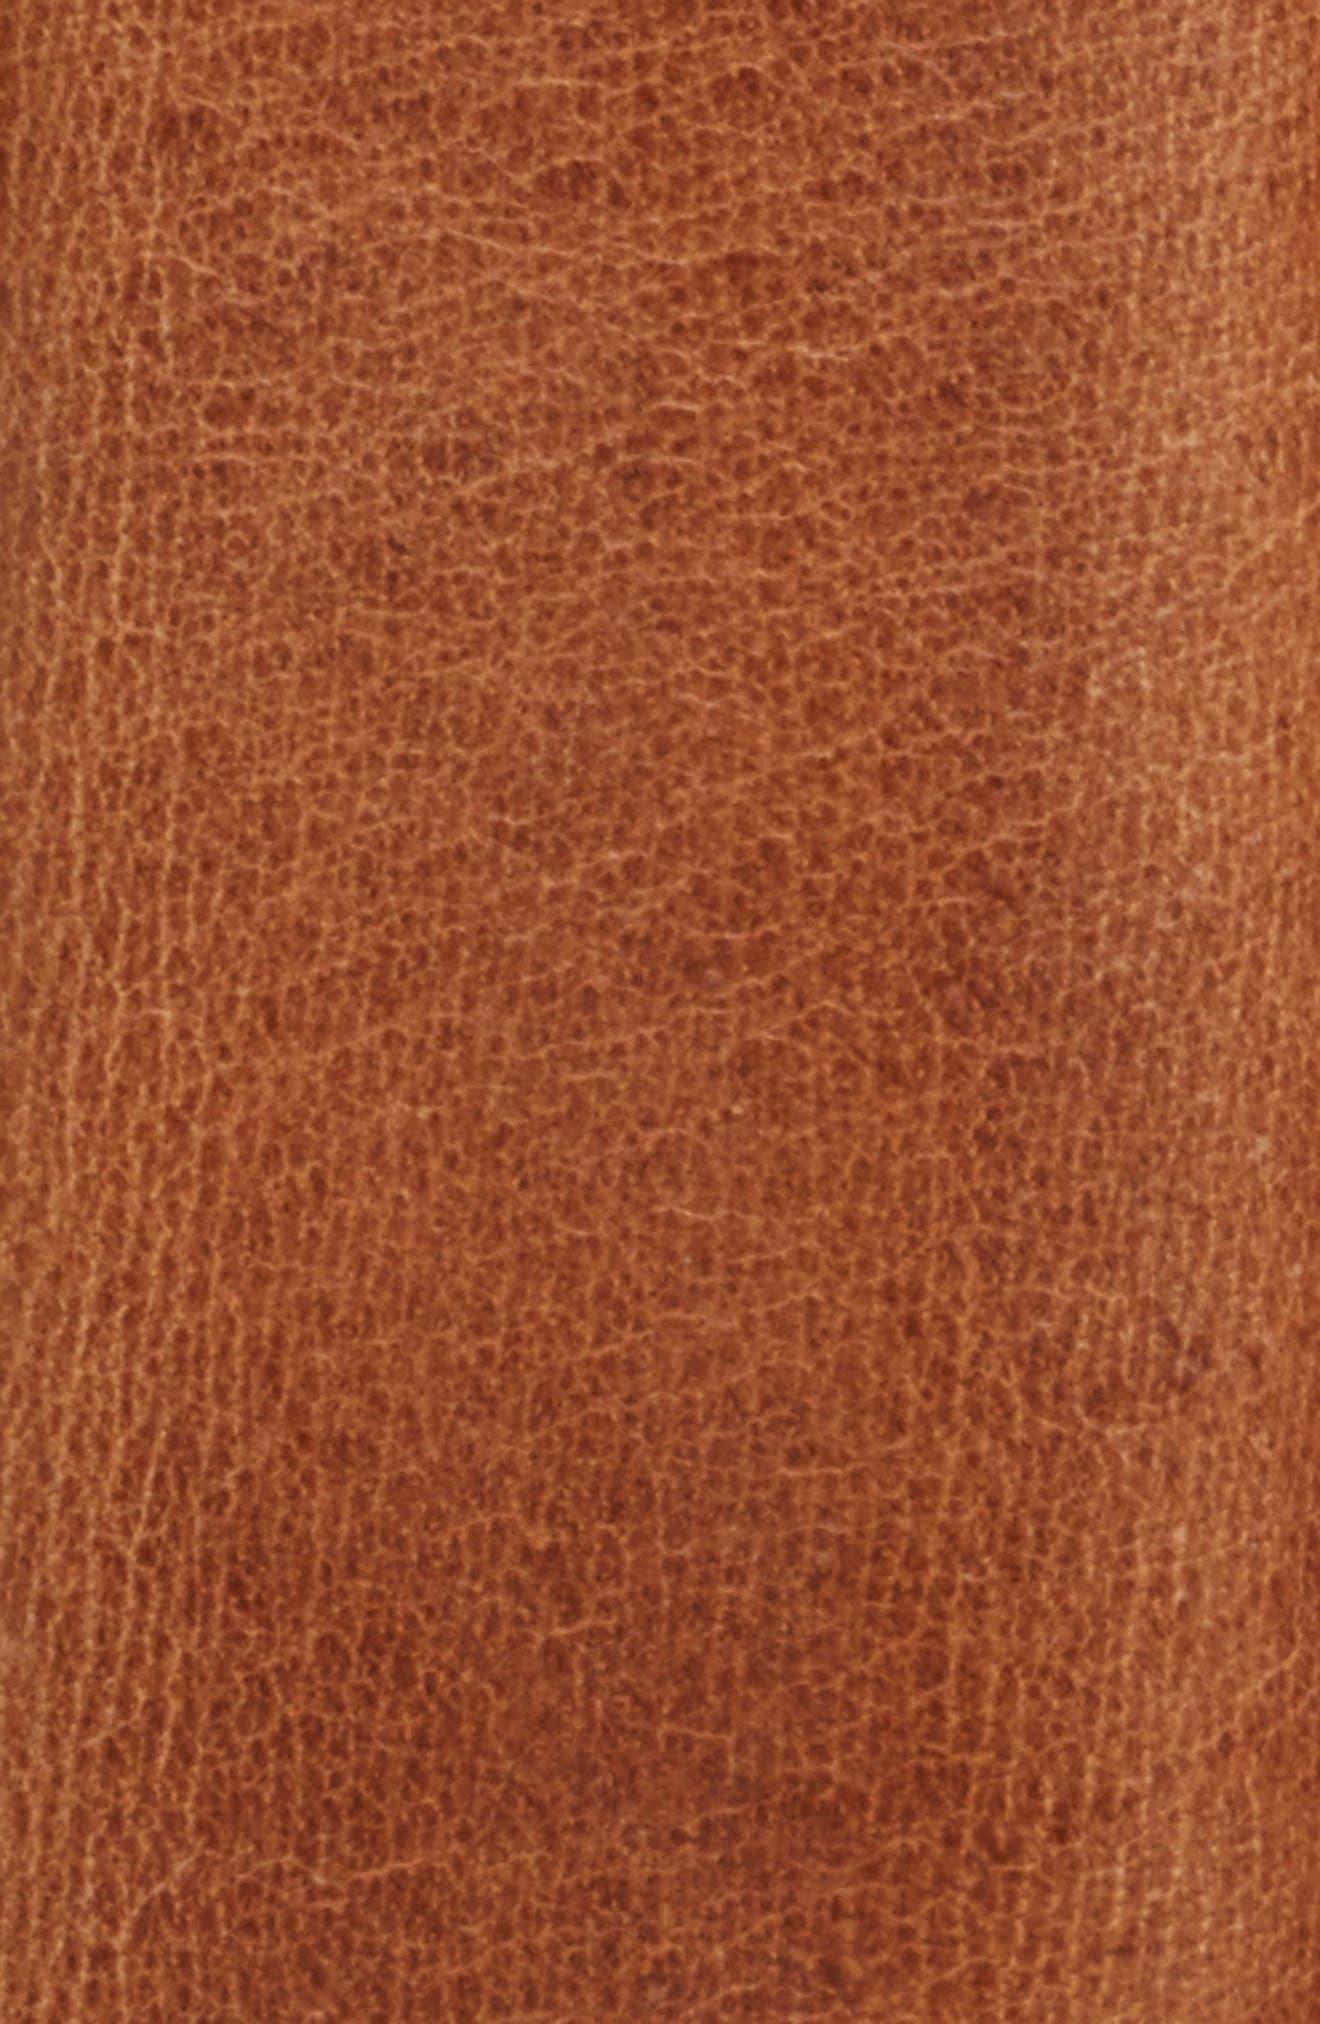 Sterling Ave. Leather Belt,                             Alternate thumbnail 2, color,